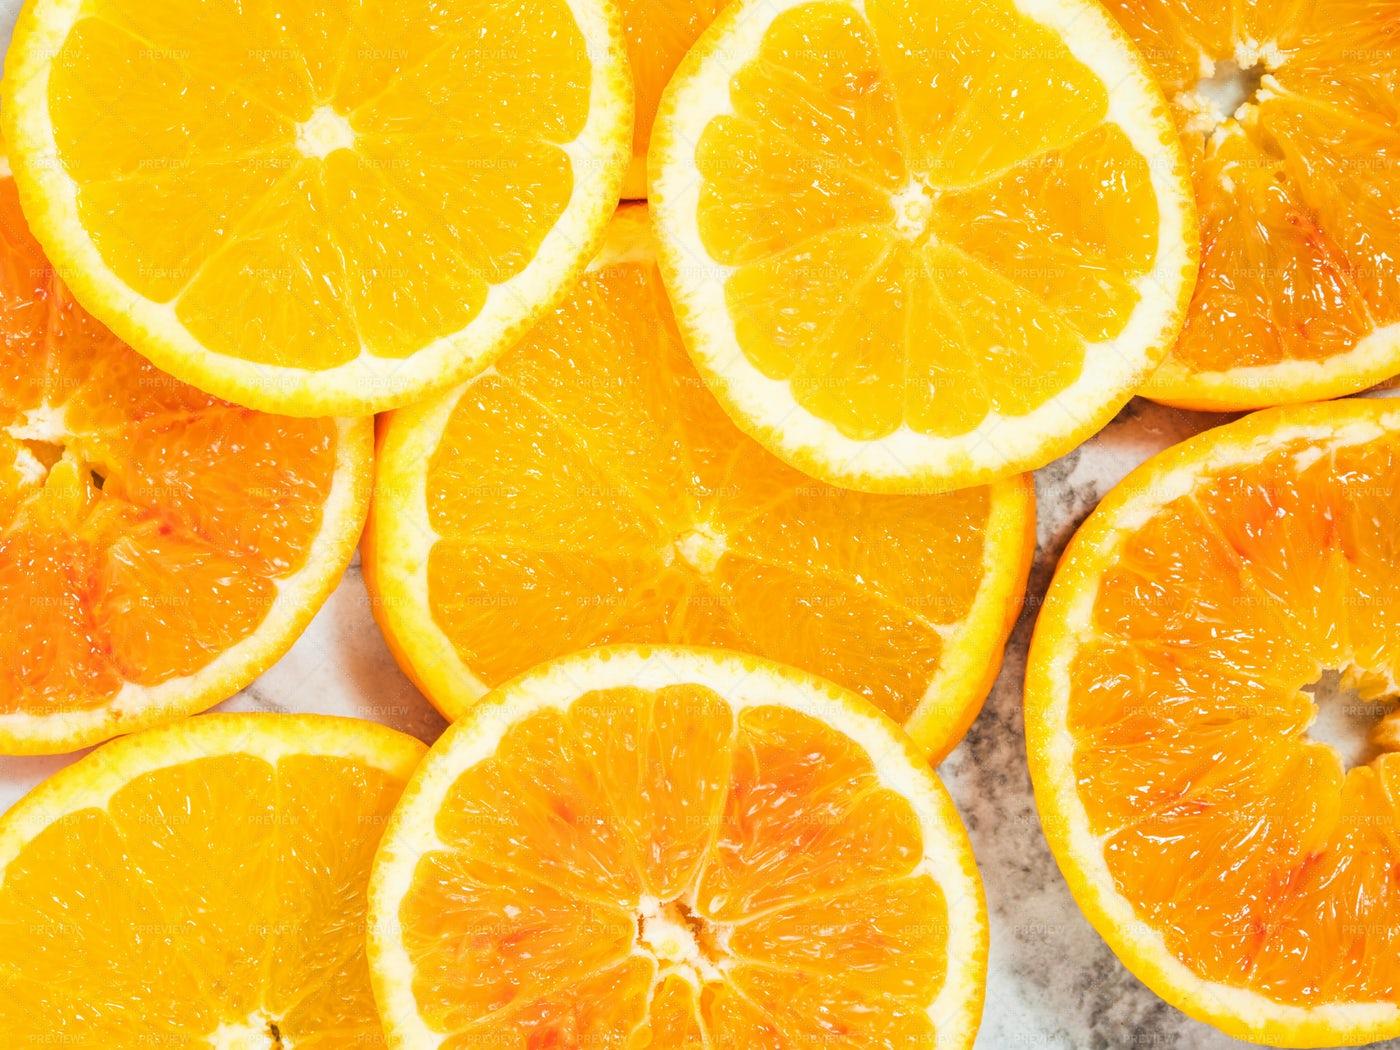 Colorful Orange Citrus Background: Stock Photos